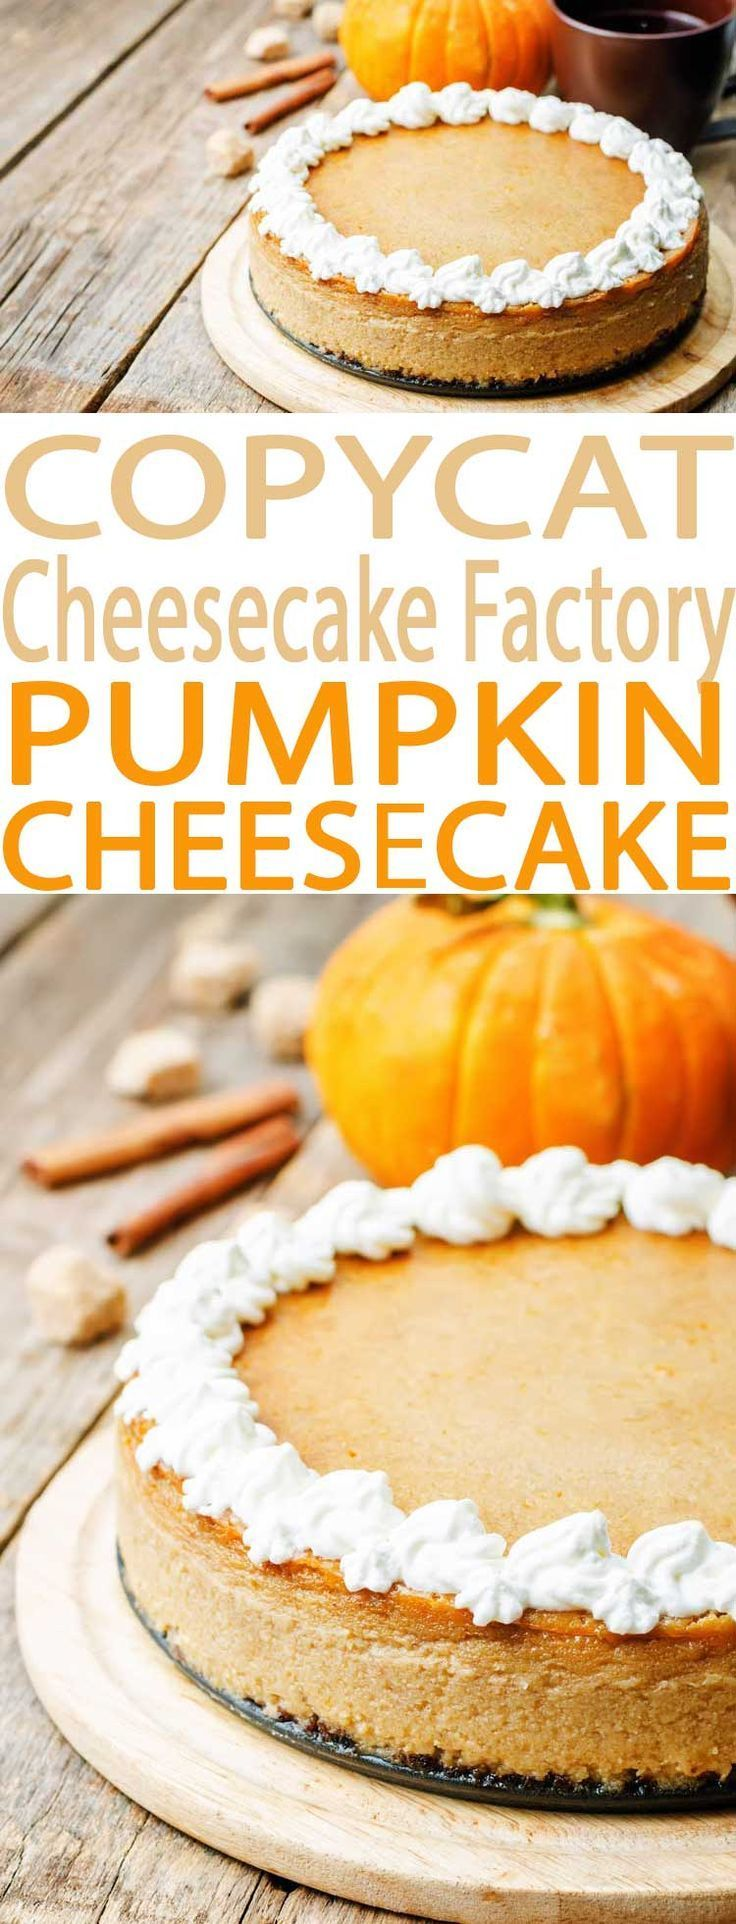 Copycat The Cheesecake Factory Pumpkin Cheesecake